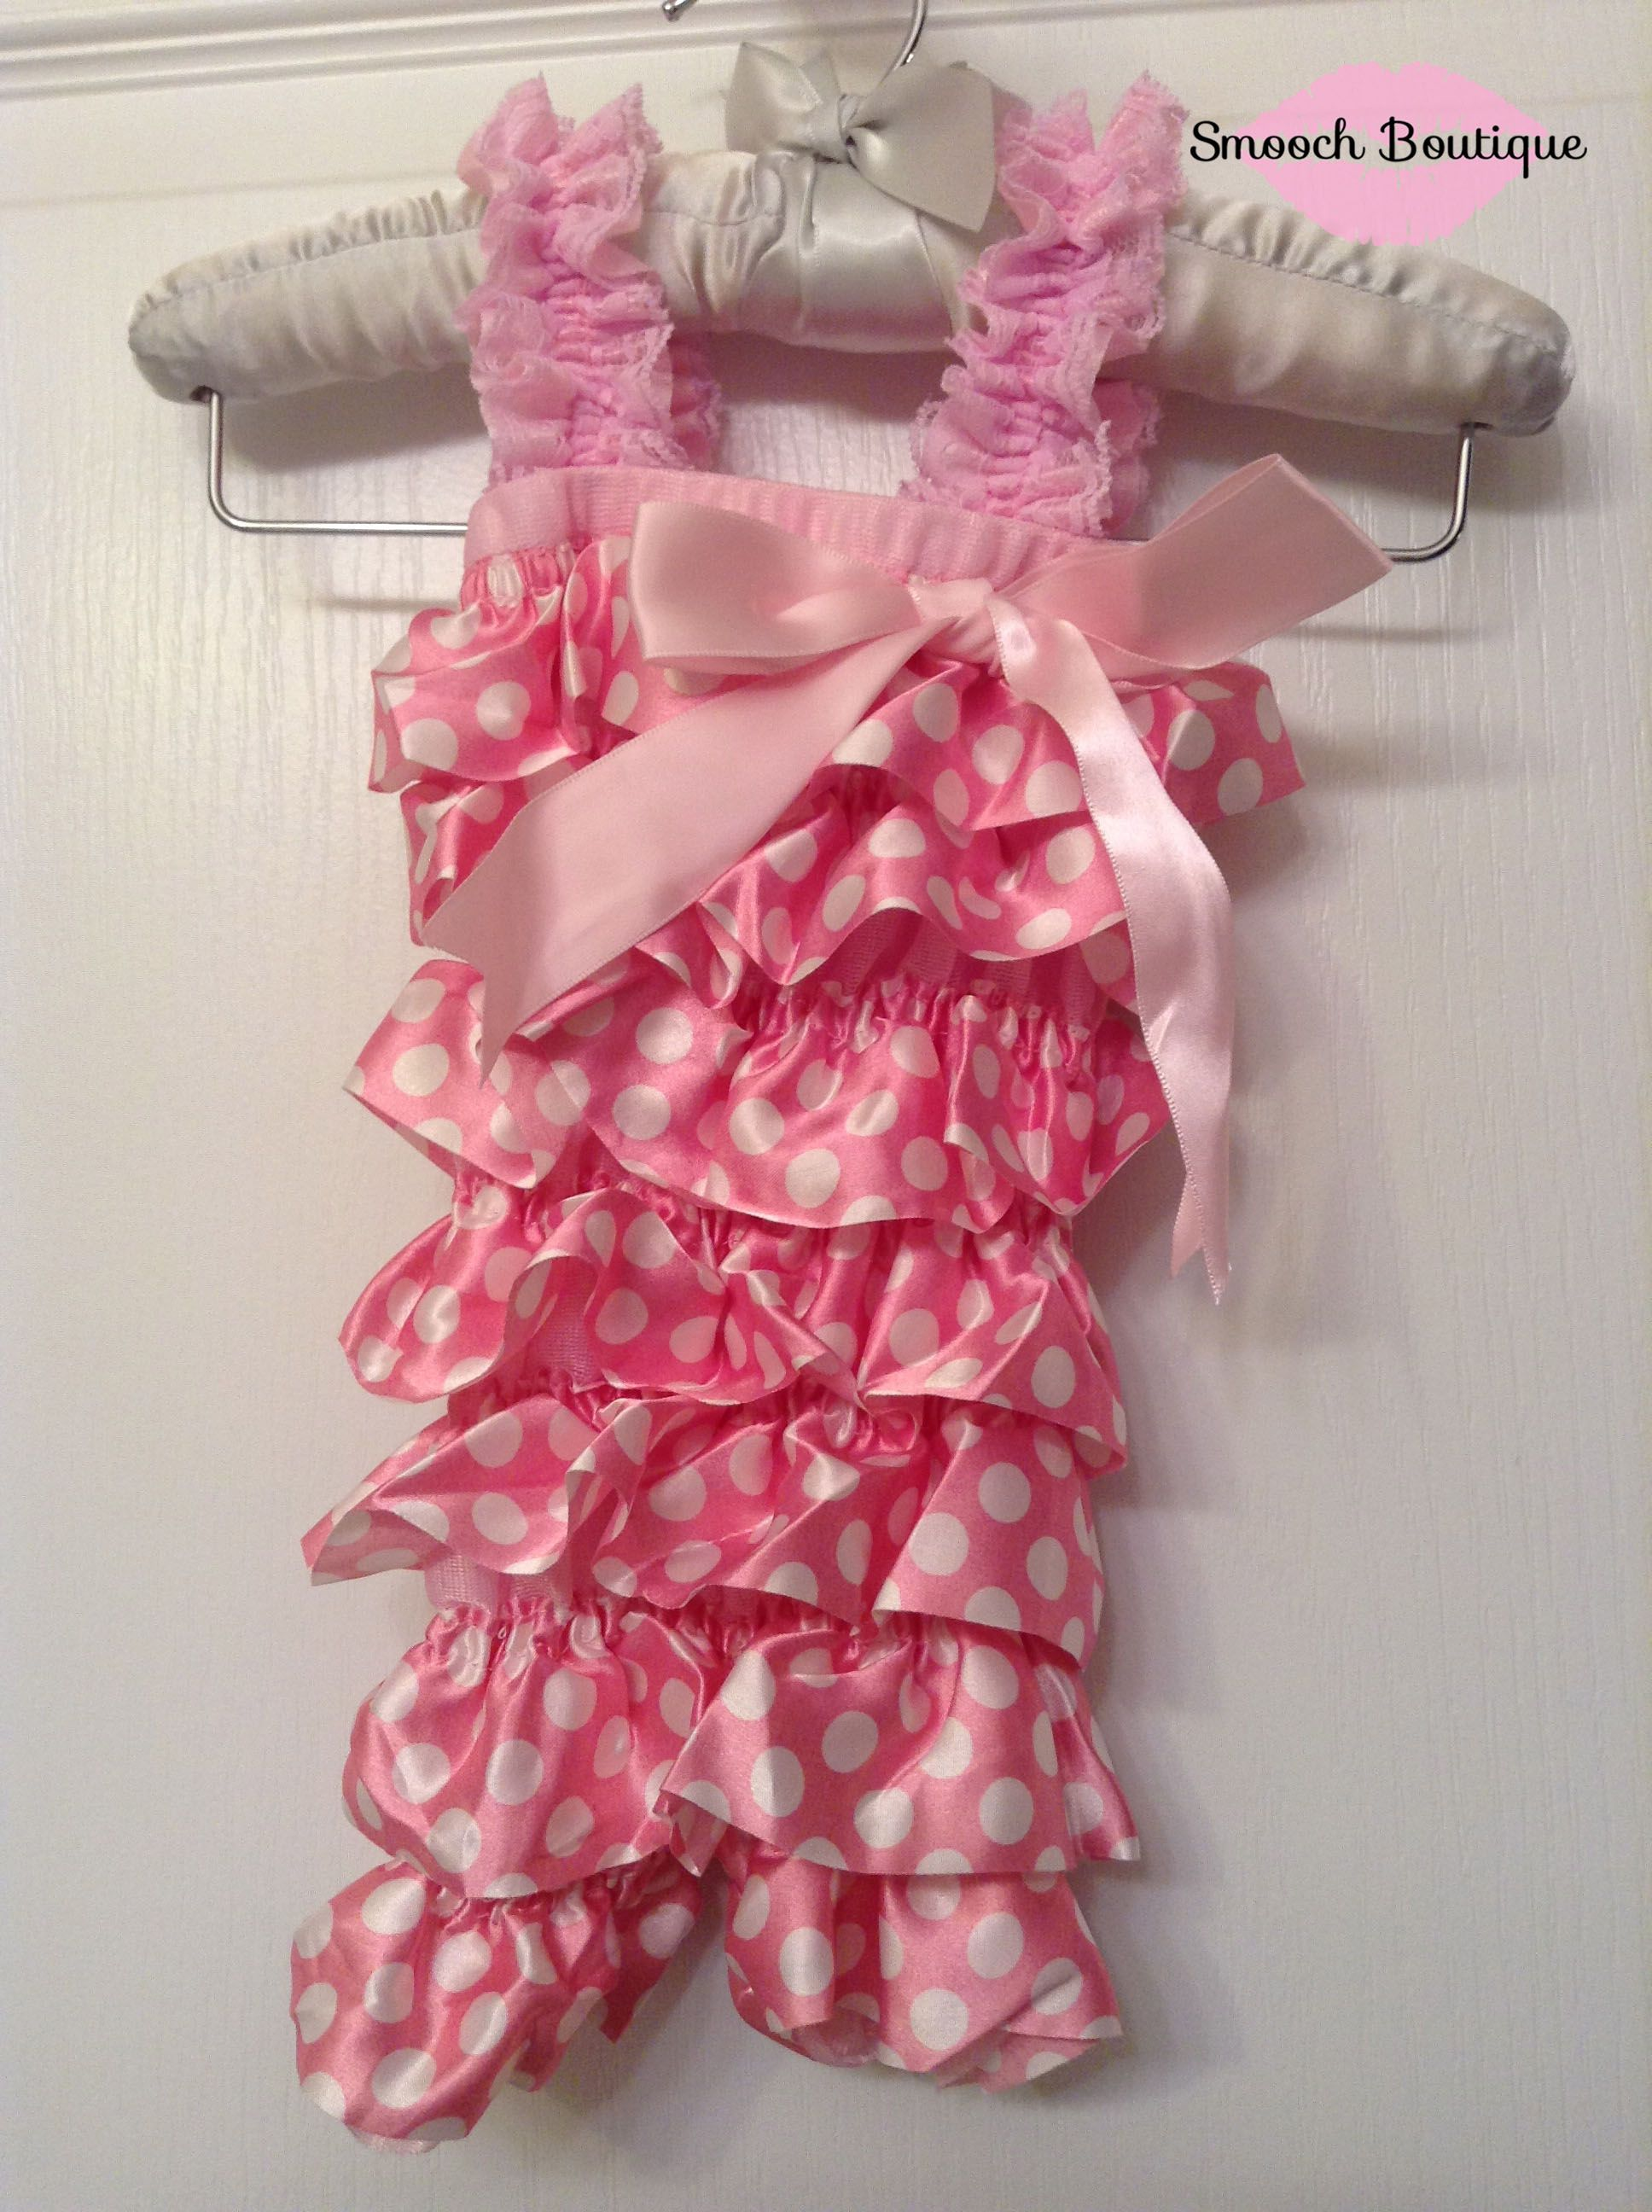 0959fe9e3f5c Soft Pink   White Polka Dot Satin Ruffle Petti Romper — Smooch Boutique